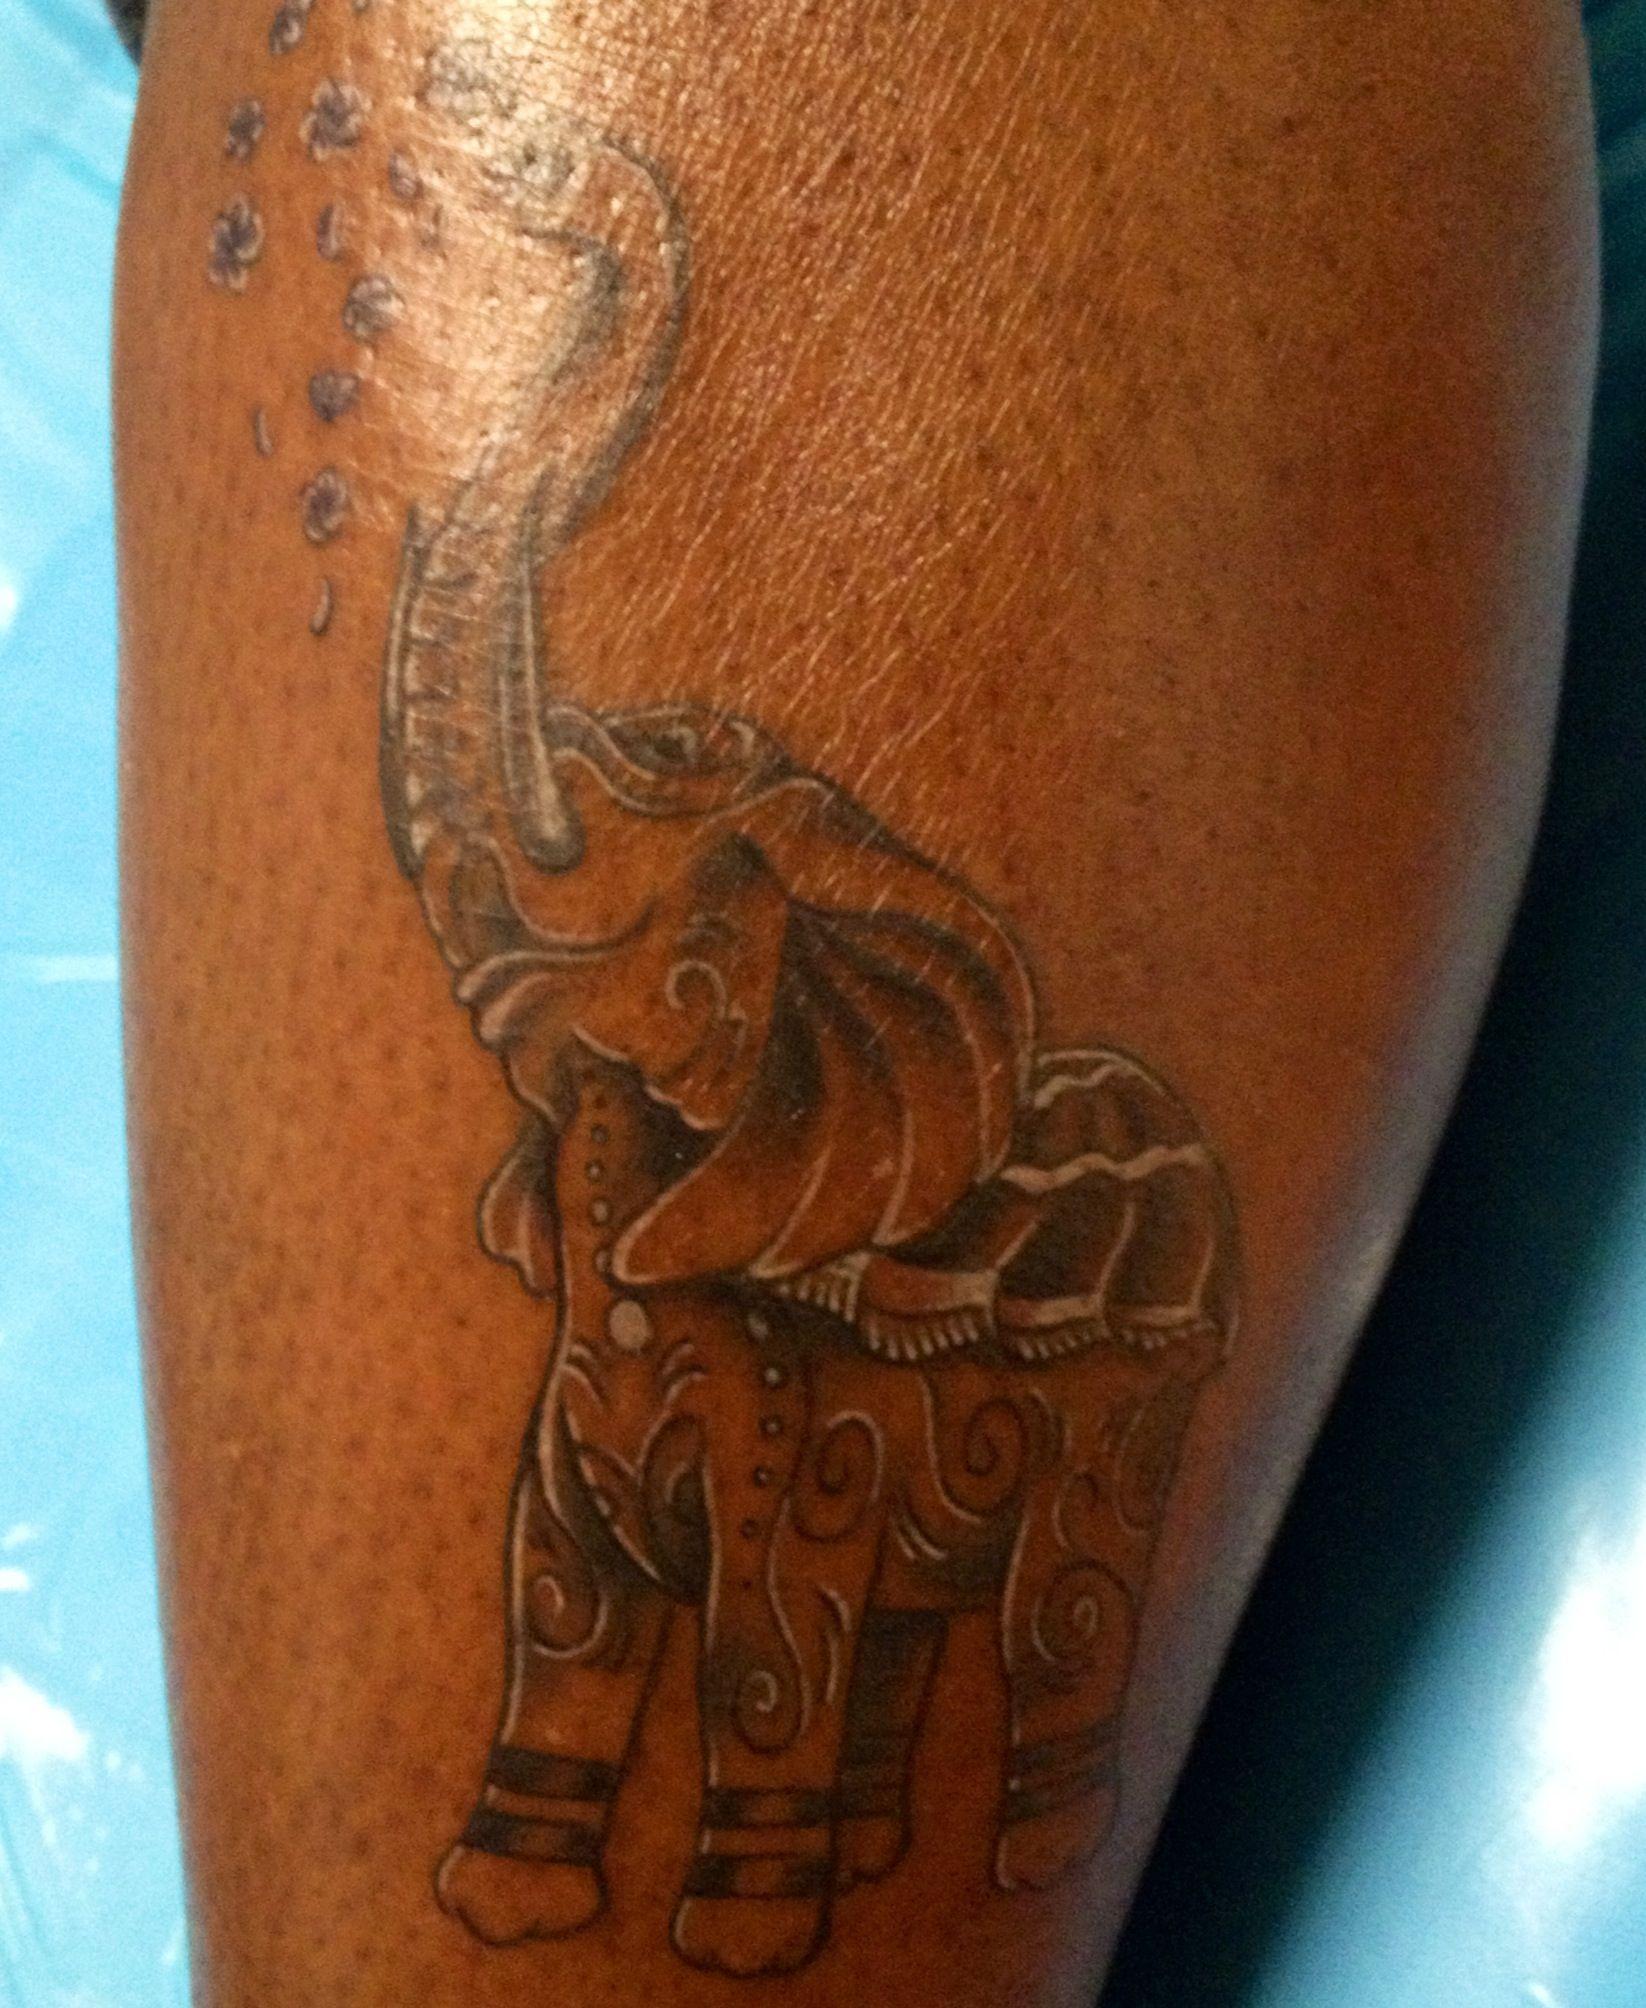 Elephant tattoo white ink and gray undertone Dark skin